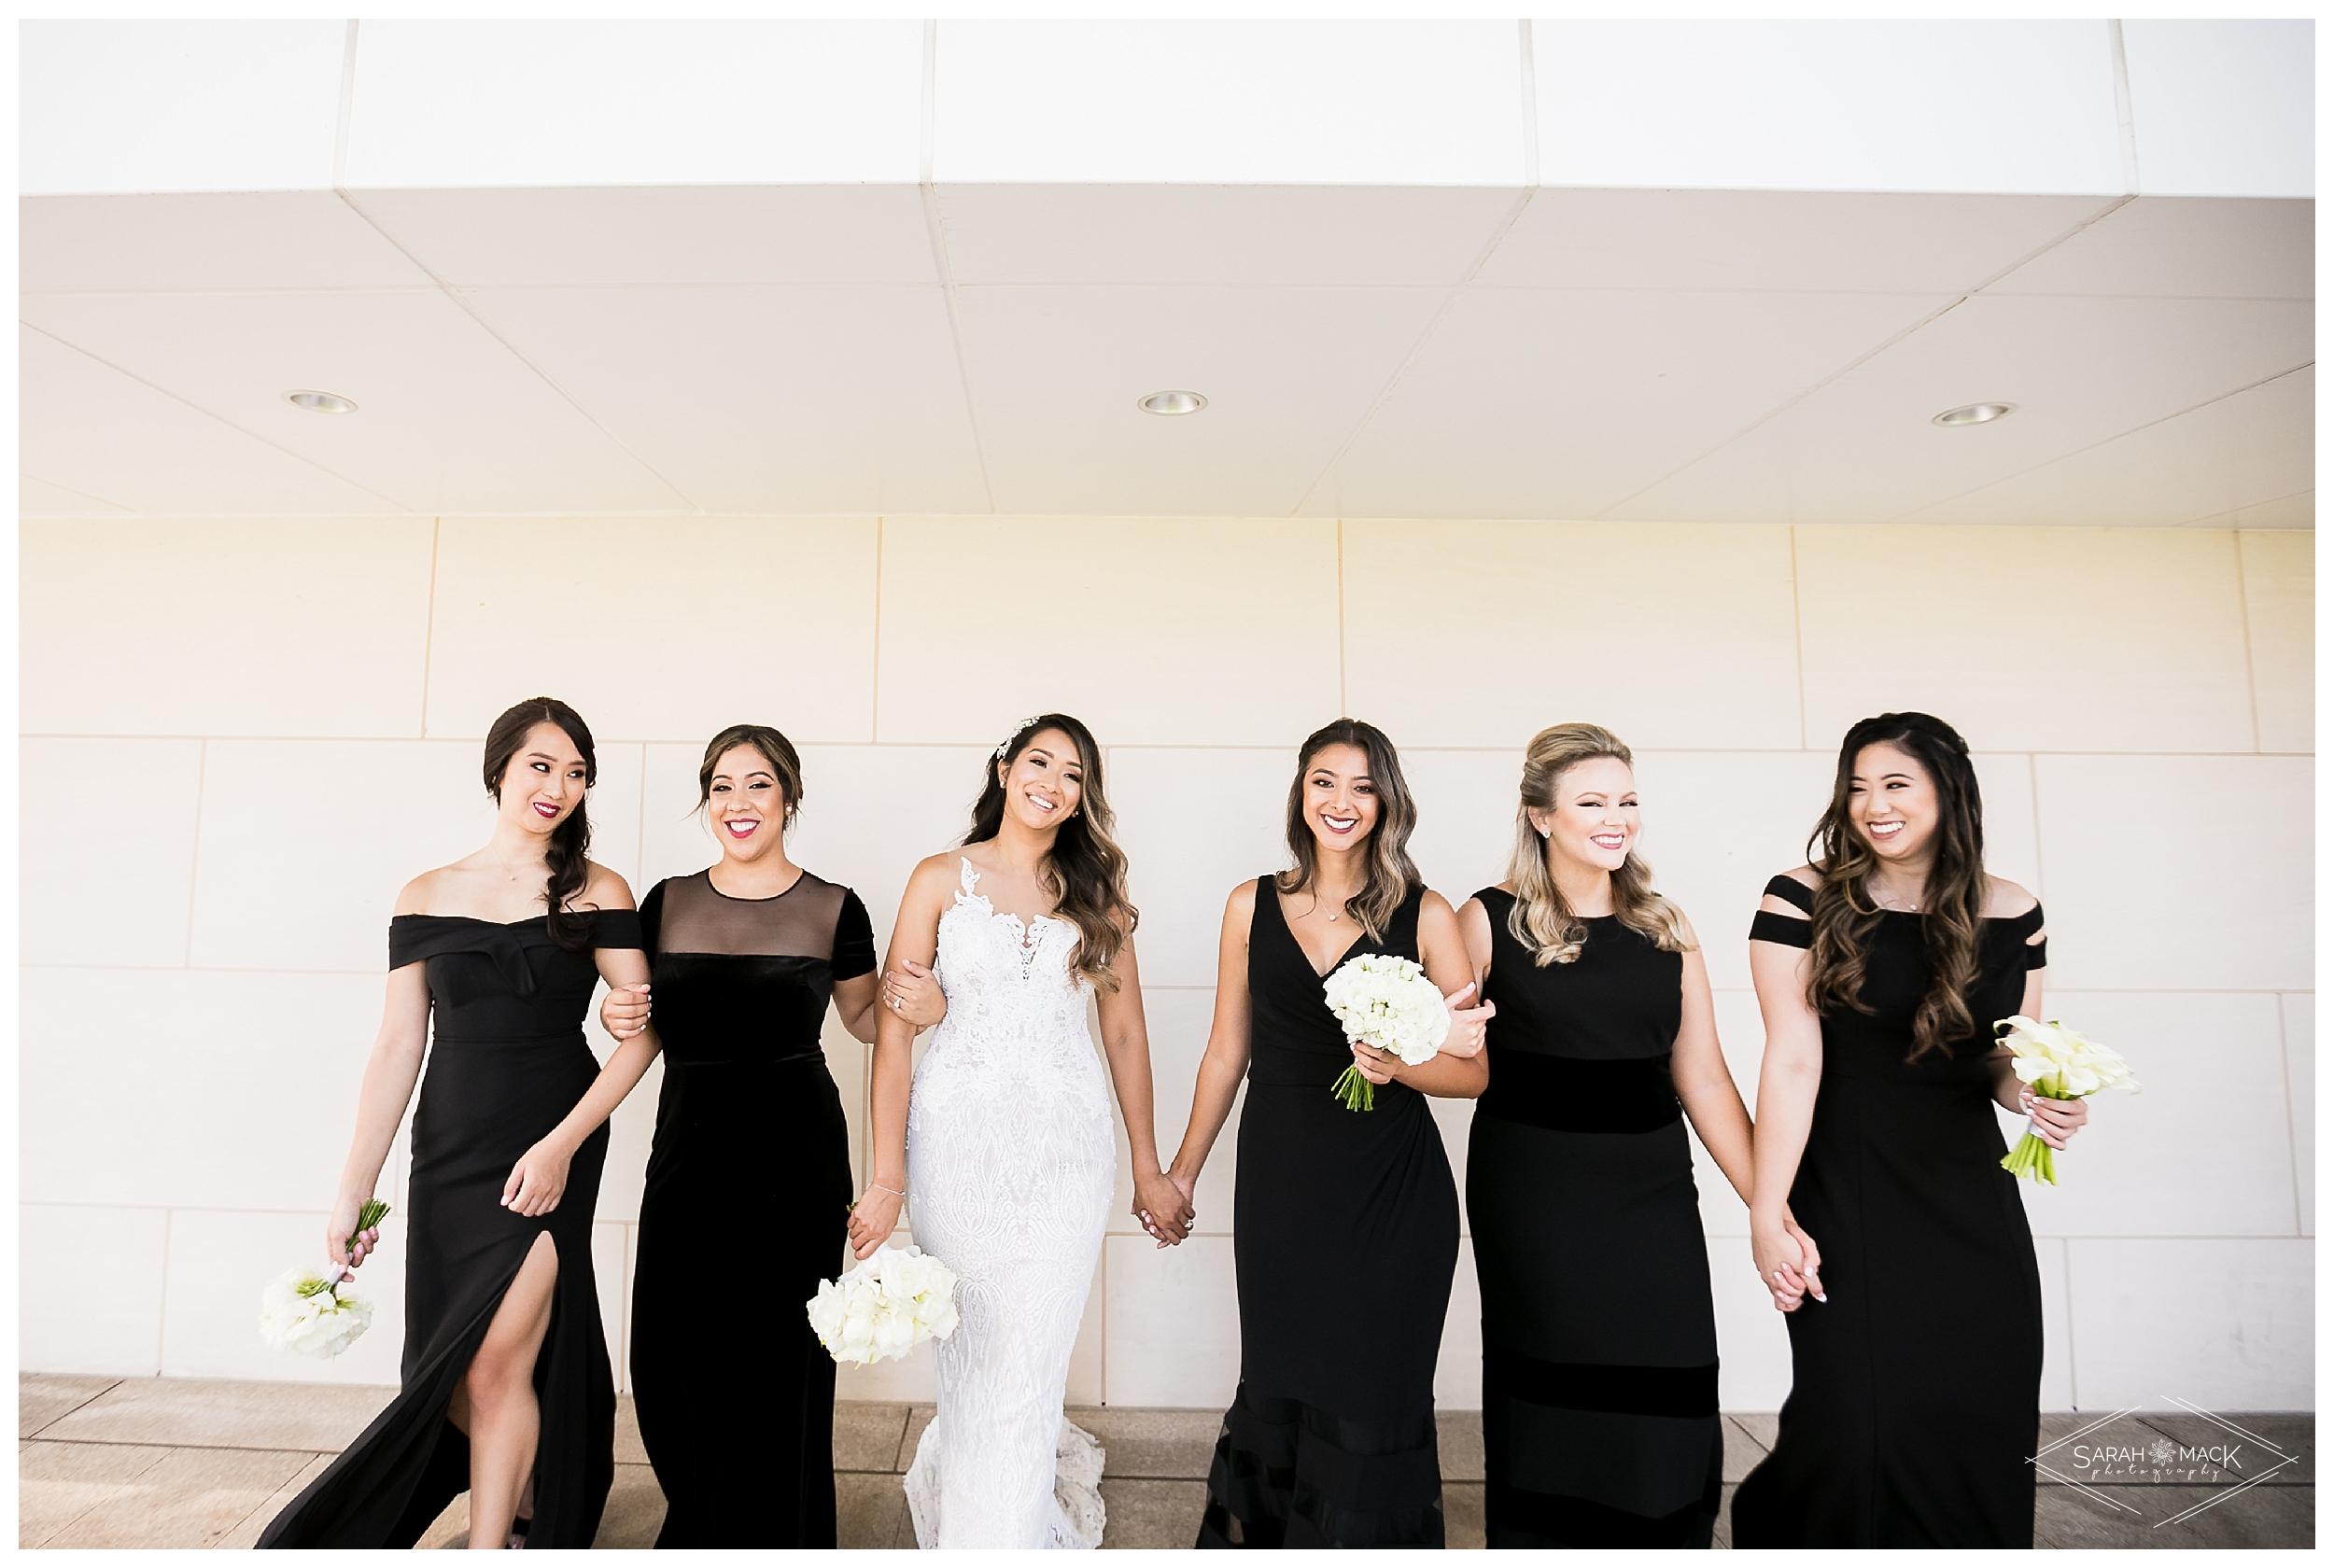 LE-Avenue-of-the-Arts-Costa-Mesa-Wedding-Photography-0115.jpg